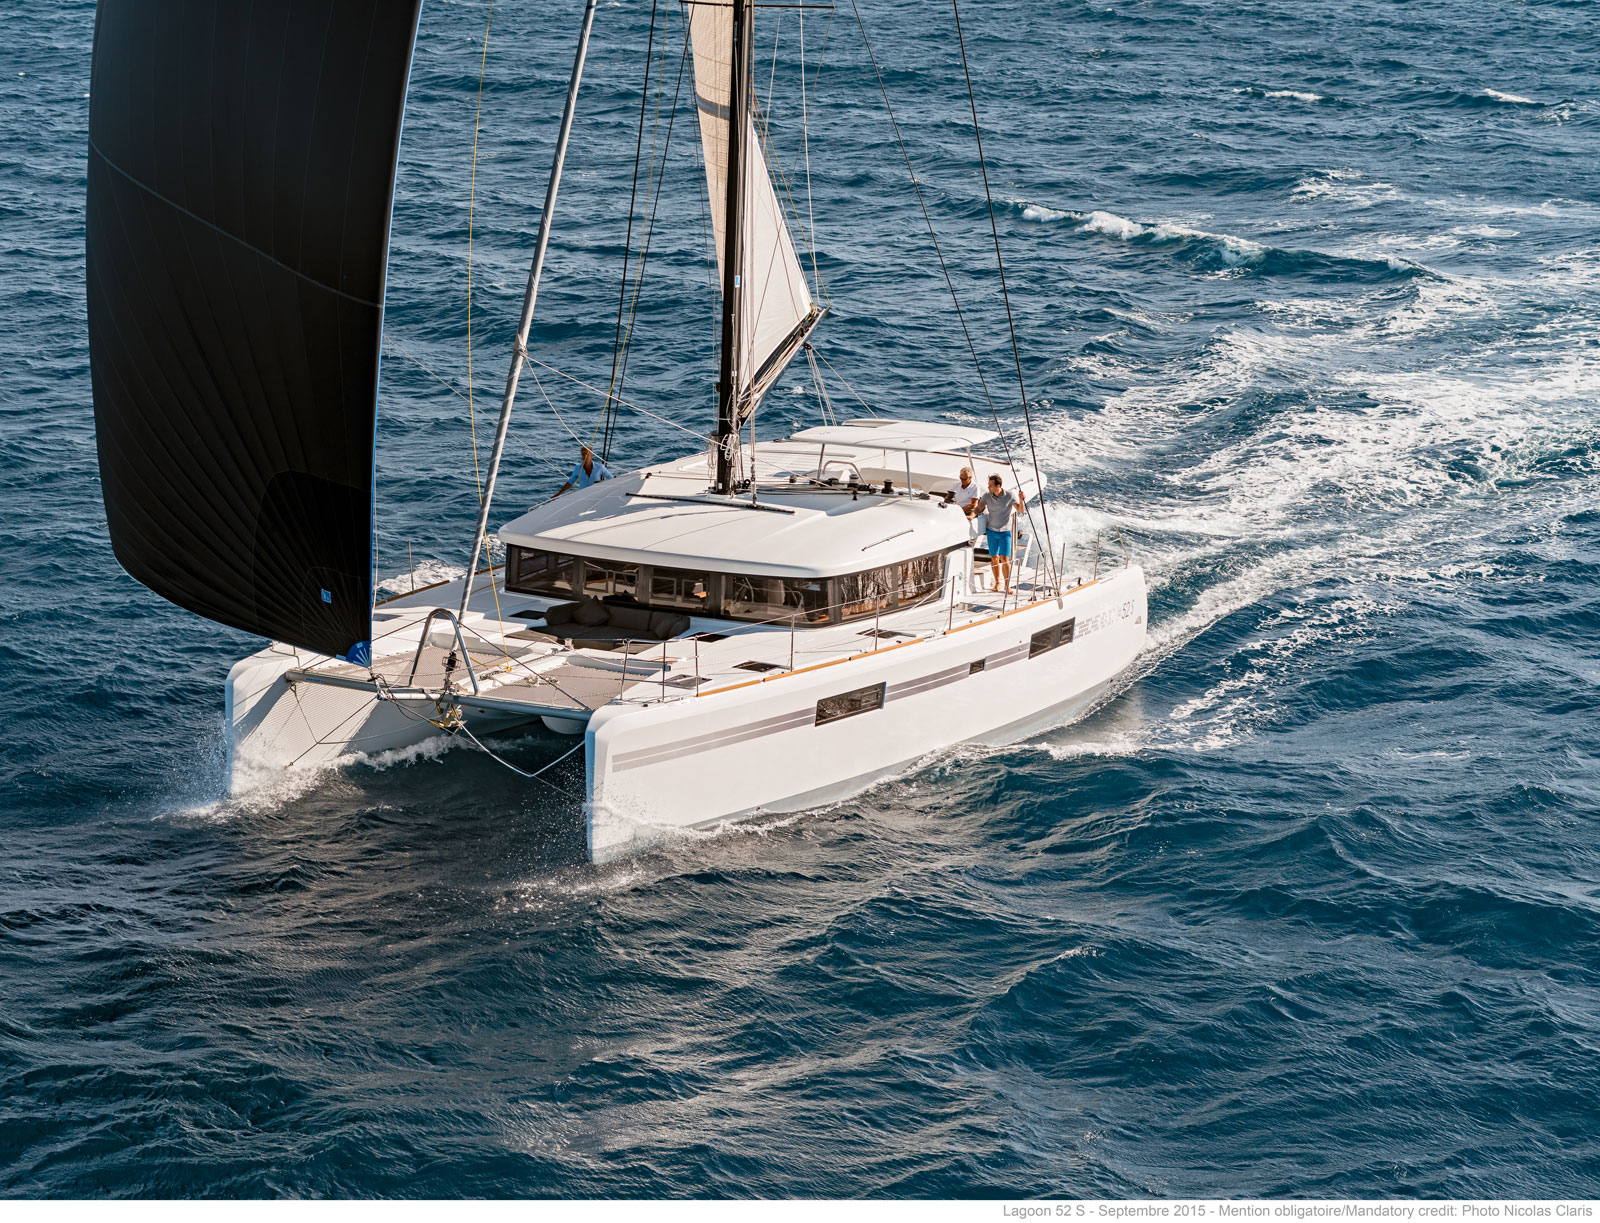 帆船 Lagoon 52S 蓝高52S双体帆船 蓝高52S双体帆船